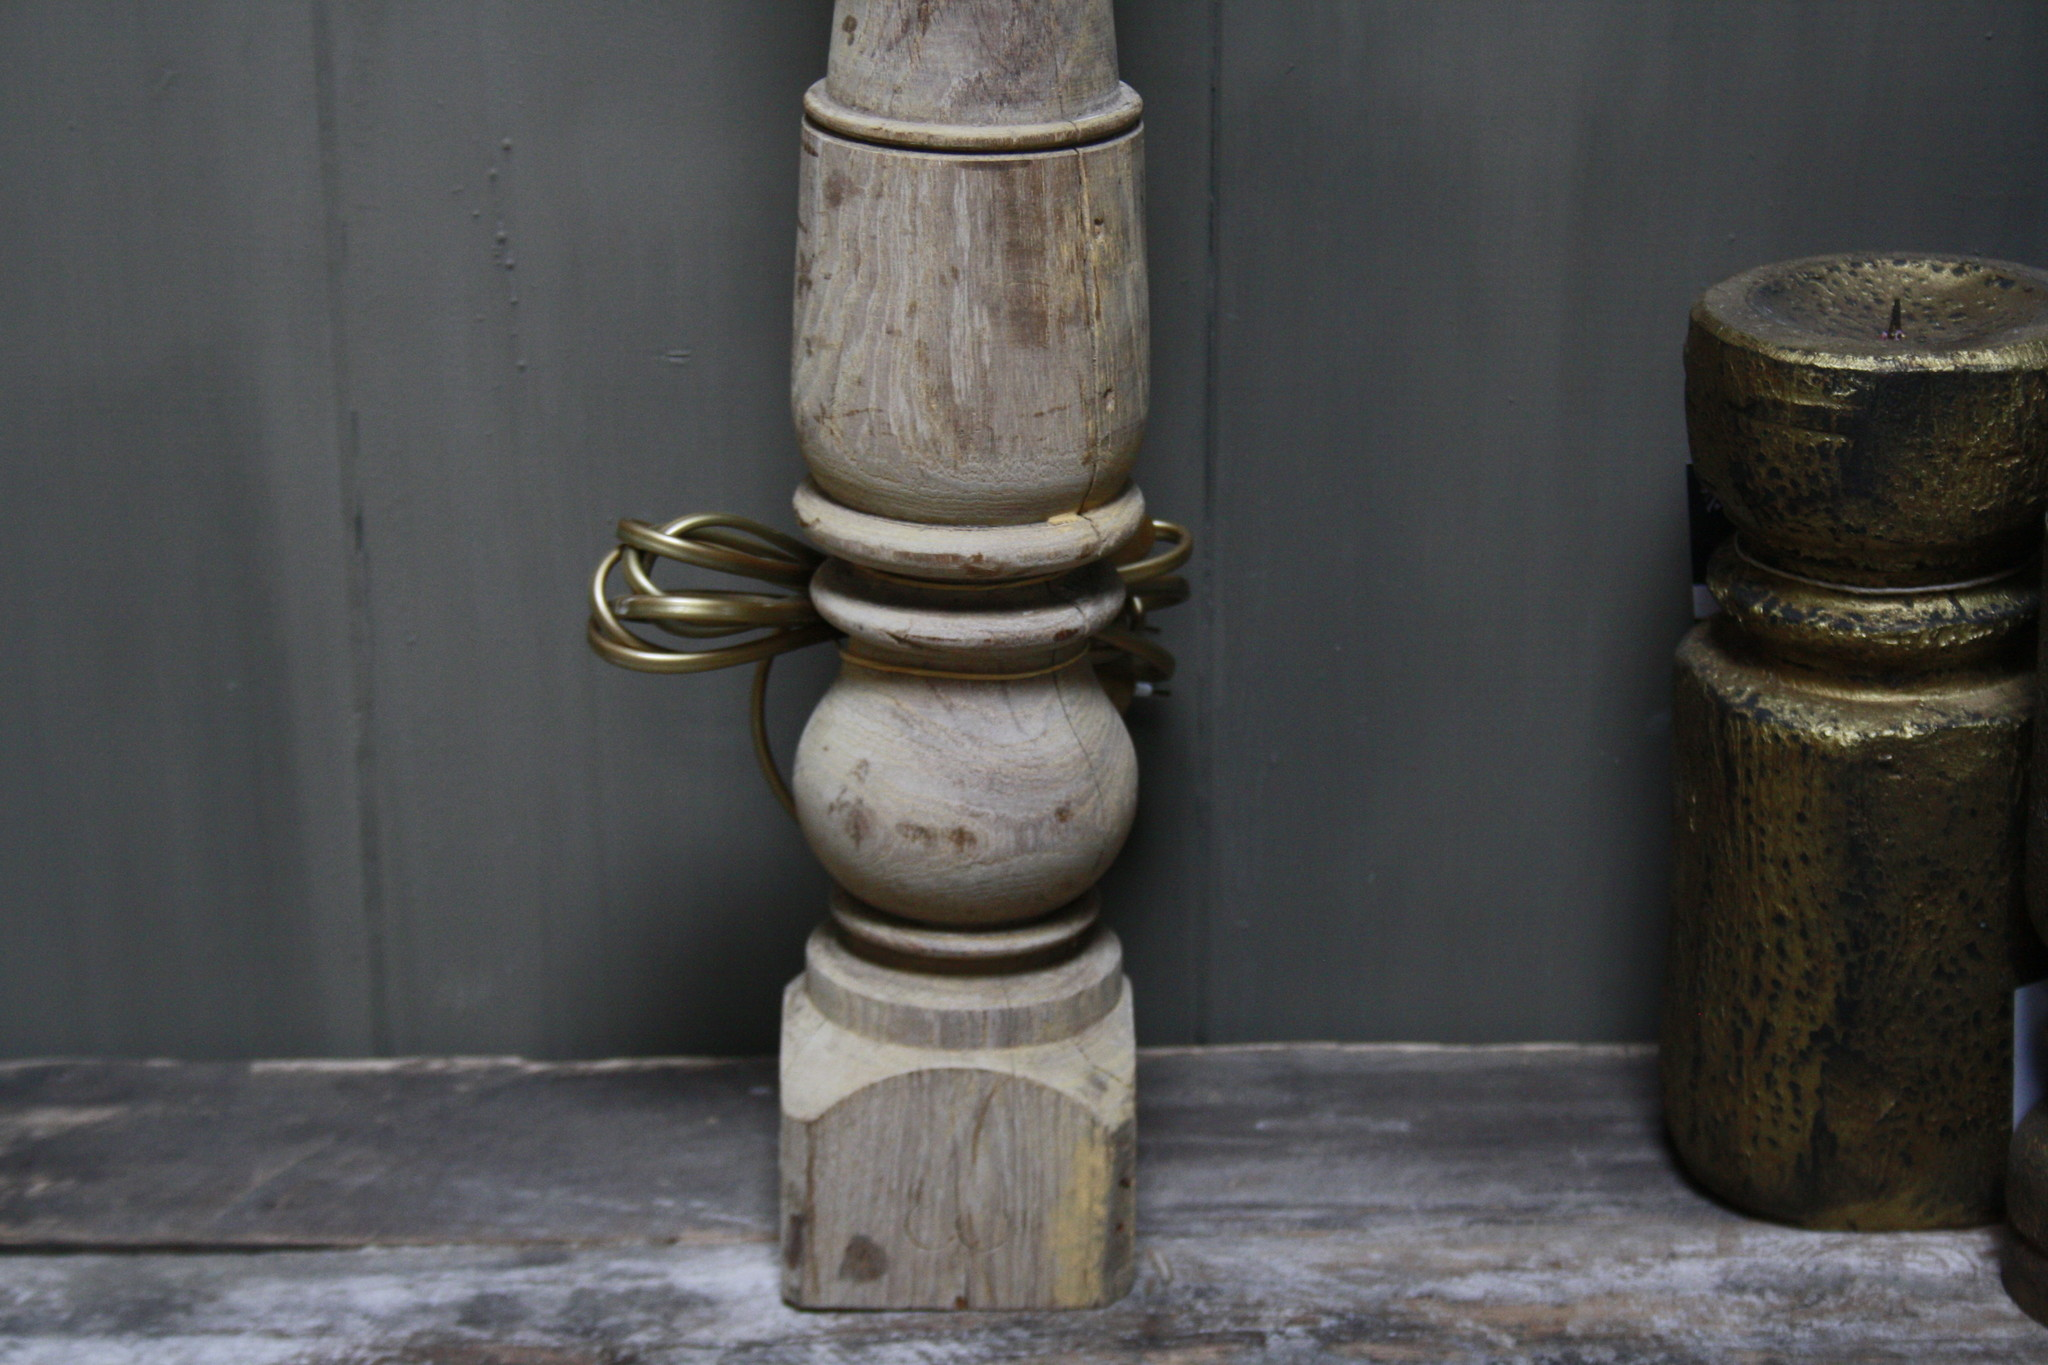 Aura peeperkorn oud houten baluster lamp 60 cm-5